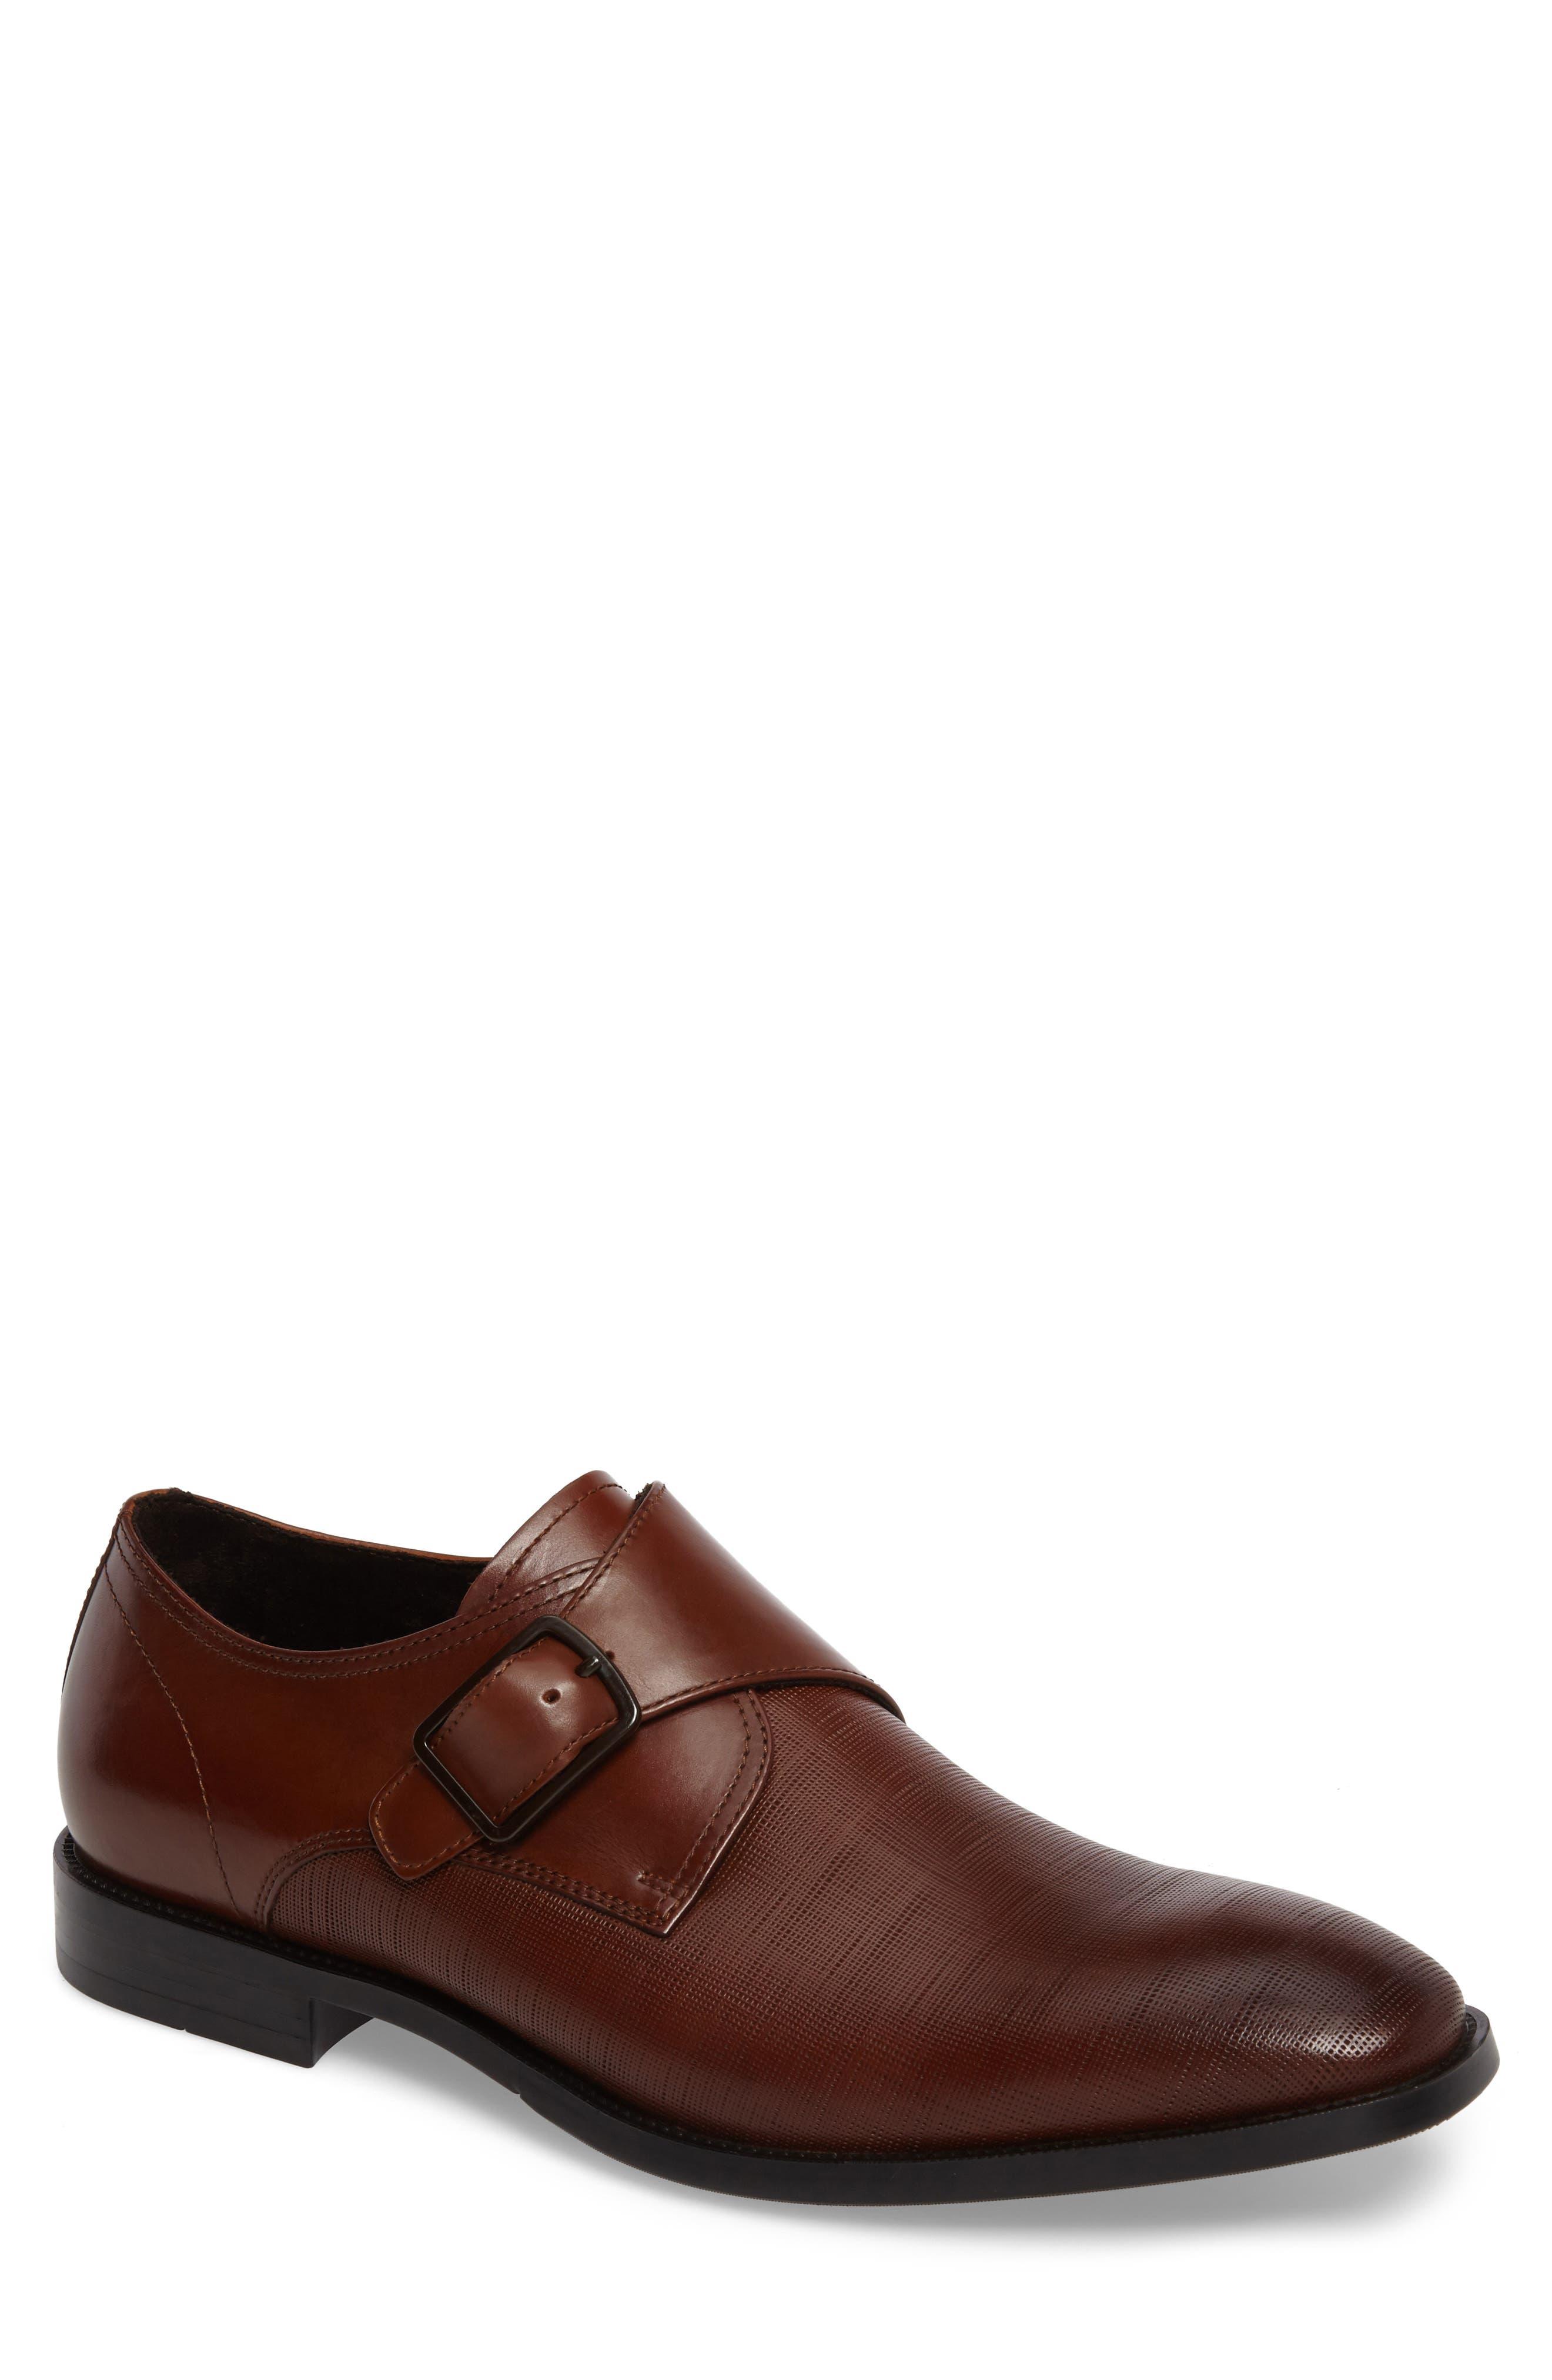 Kenneth Cole New York Golden Ticket Monk Strap Shoe (Men)